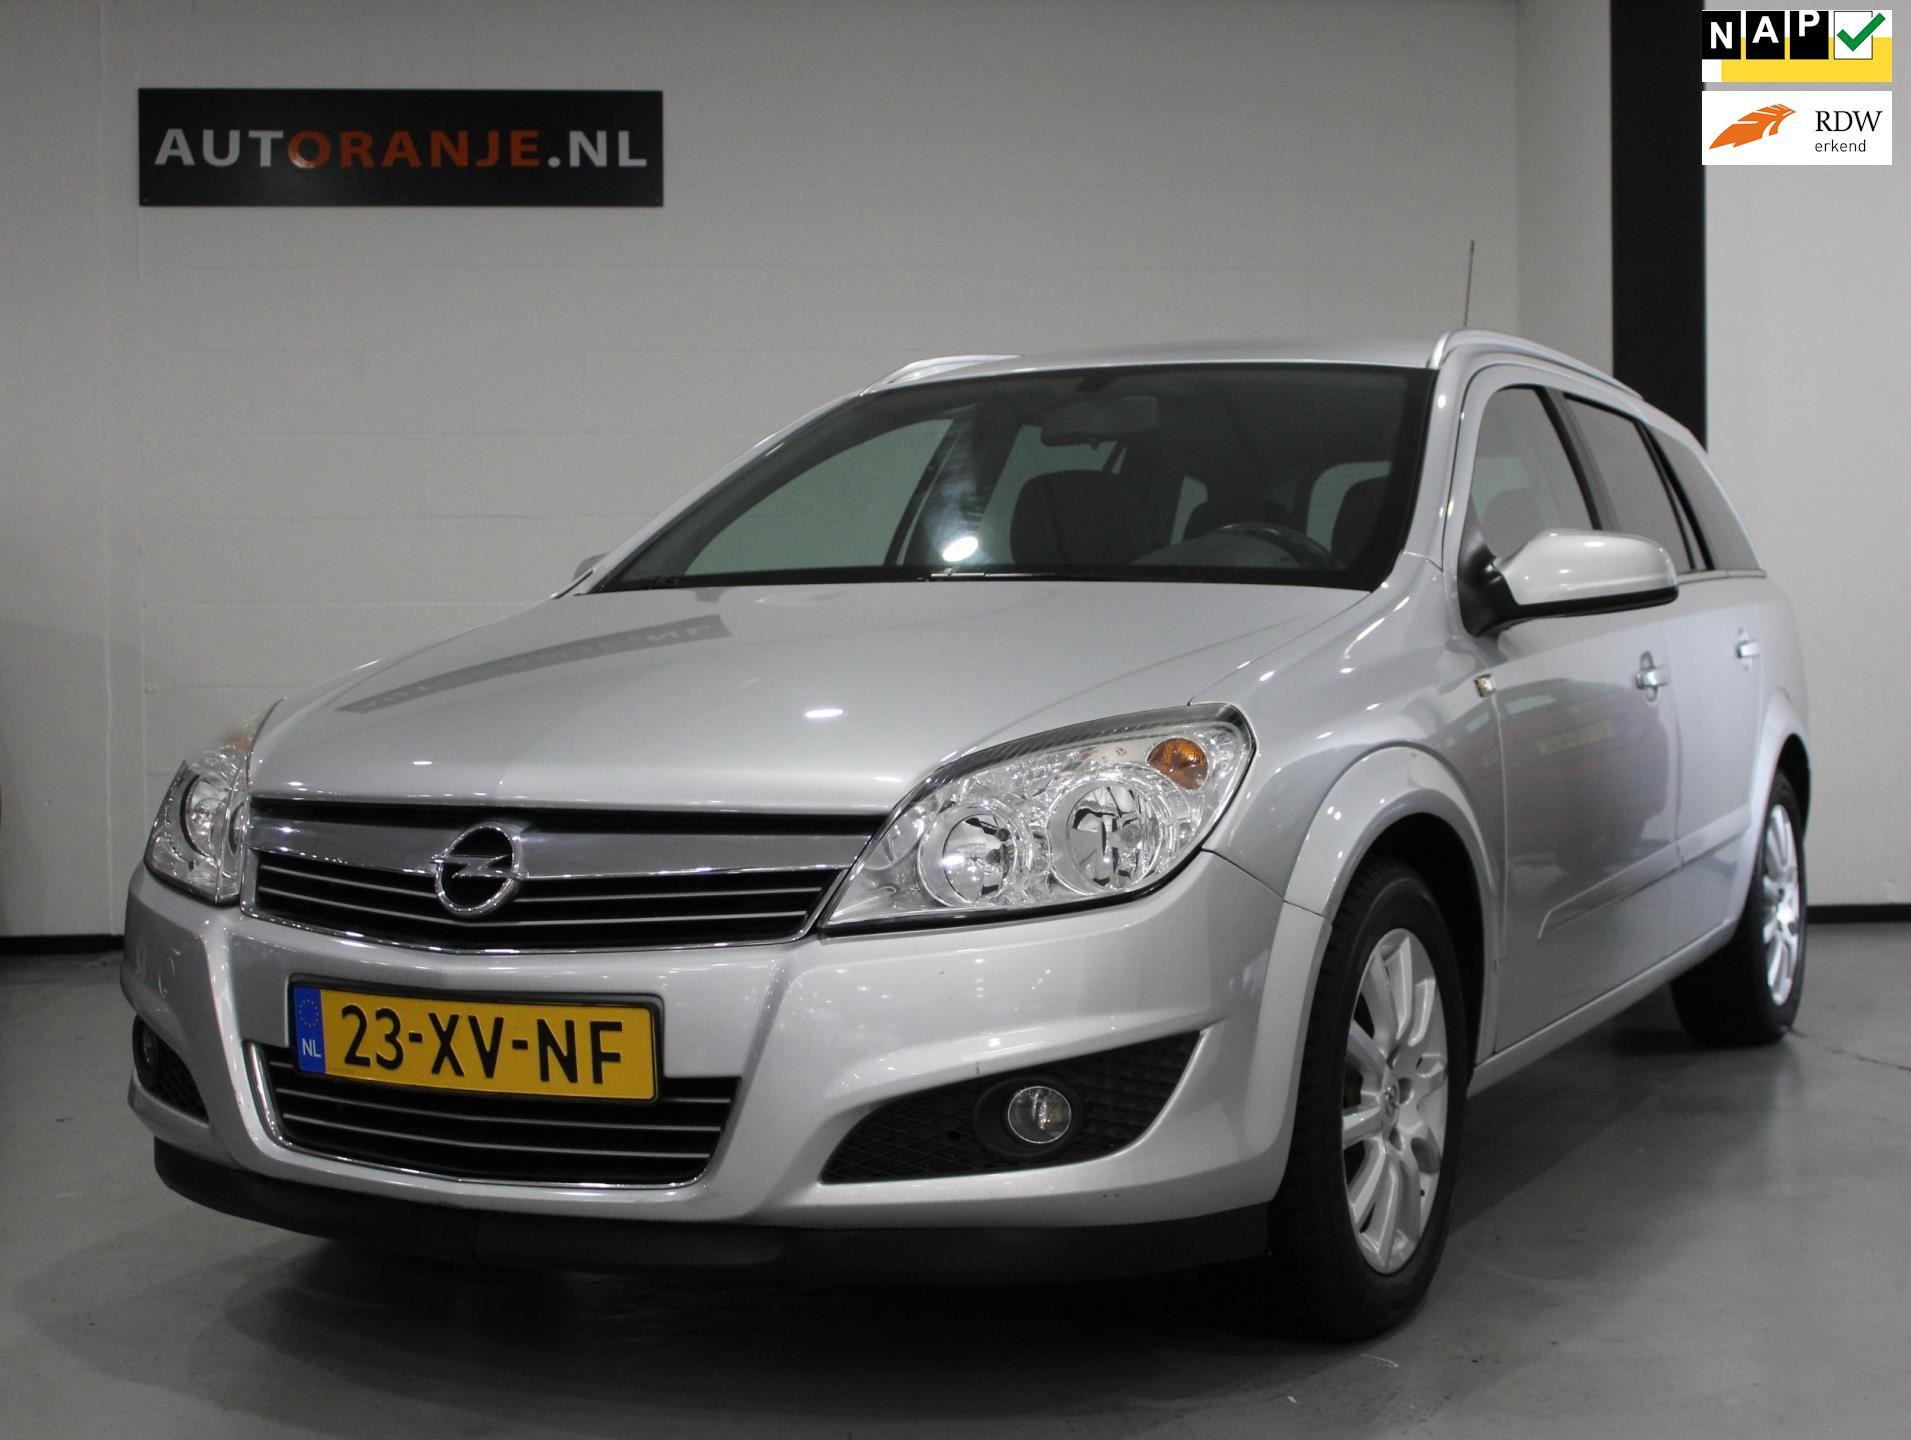 Opel Astra Wagon occasion - Autoranje